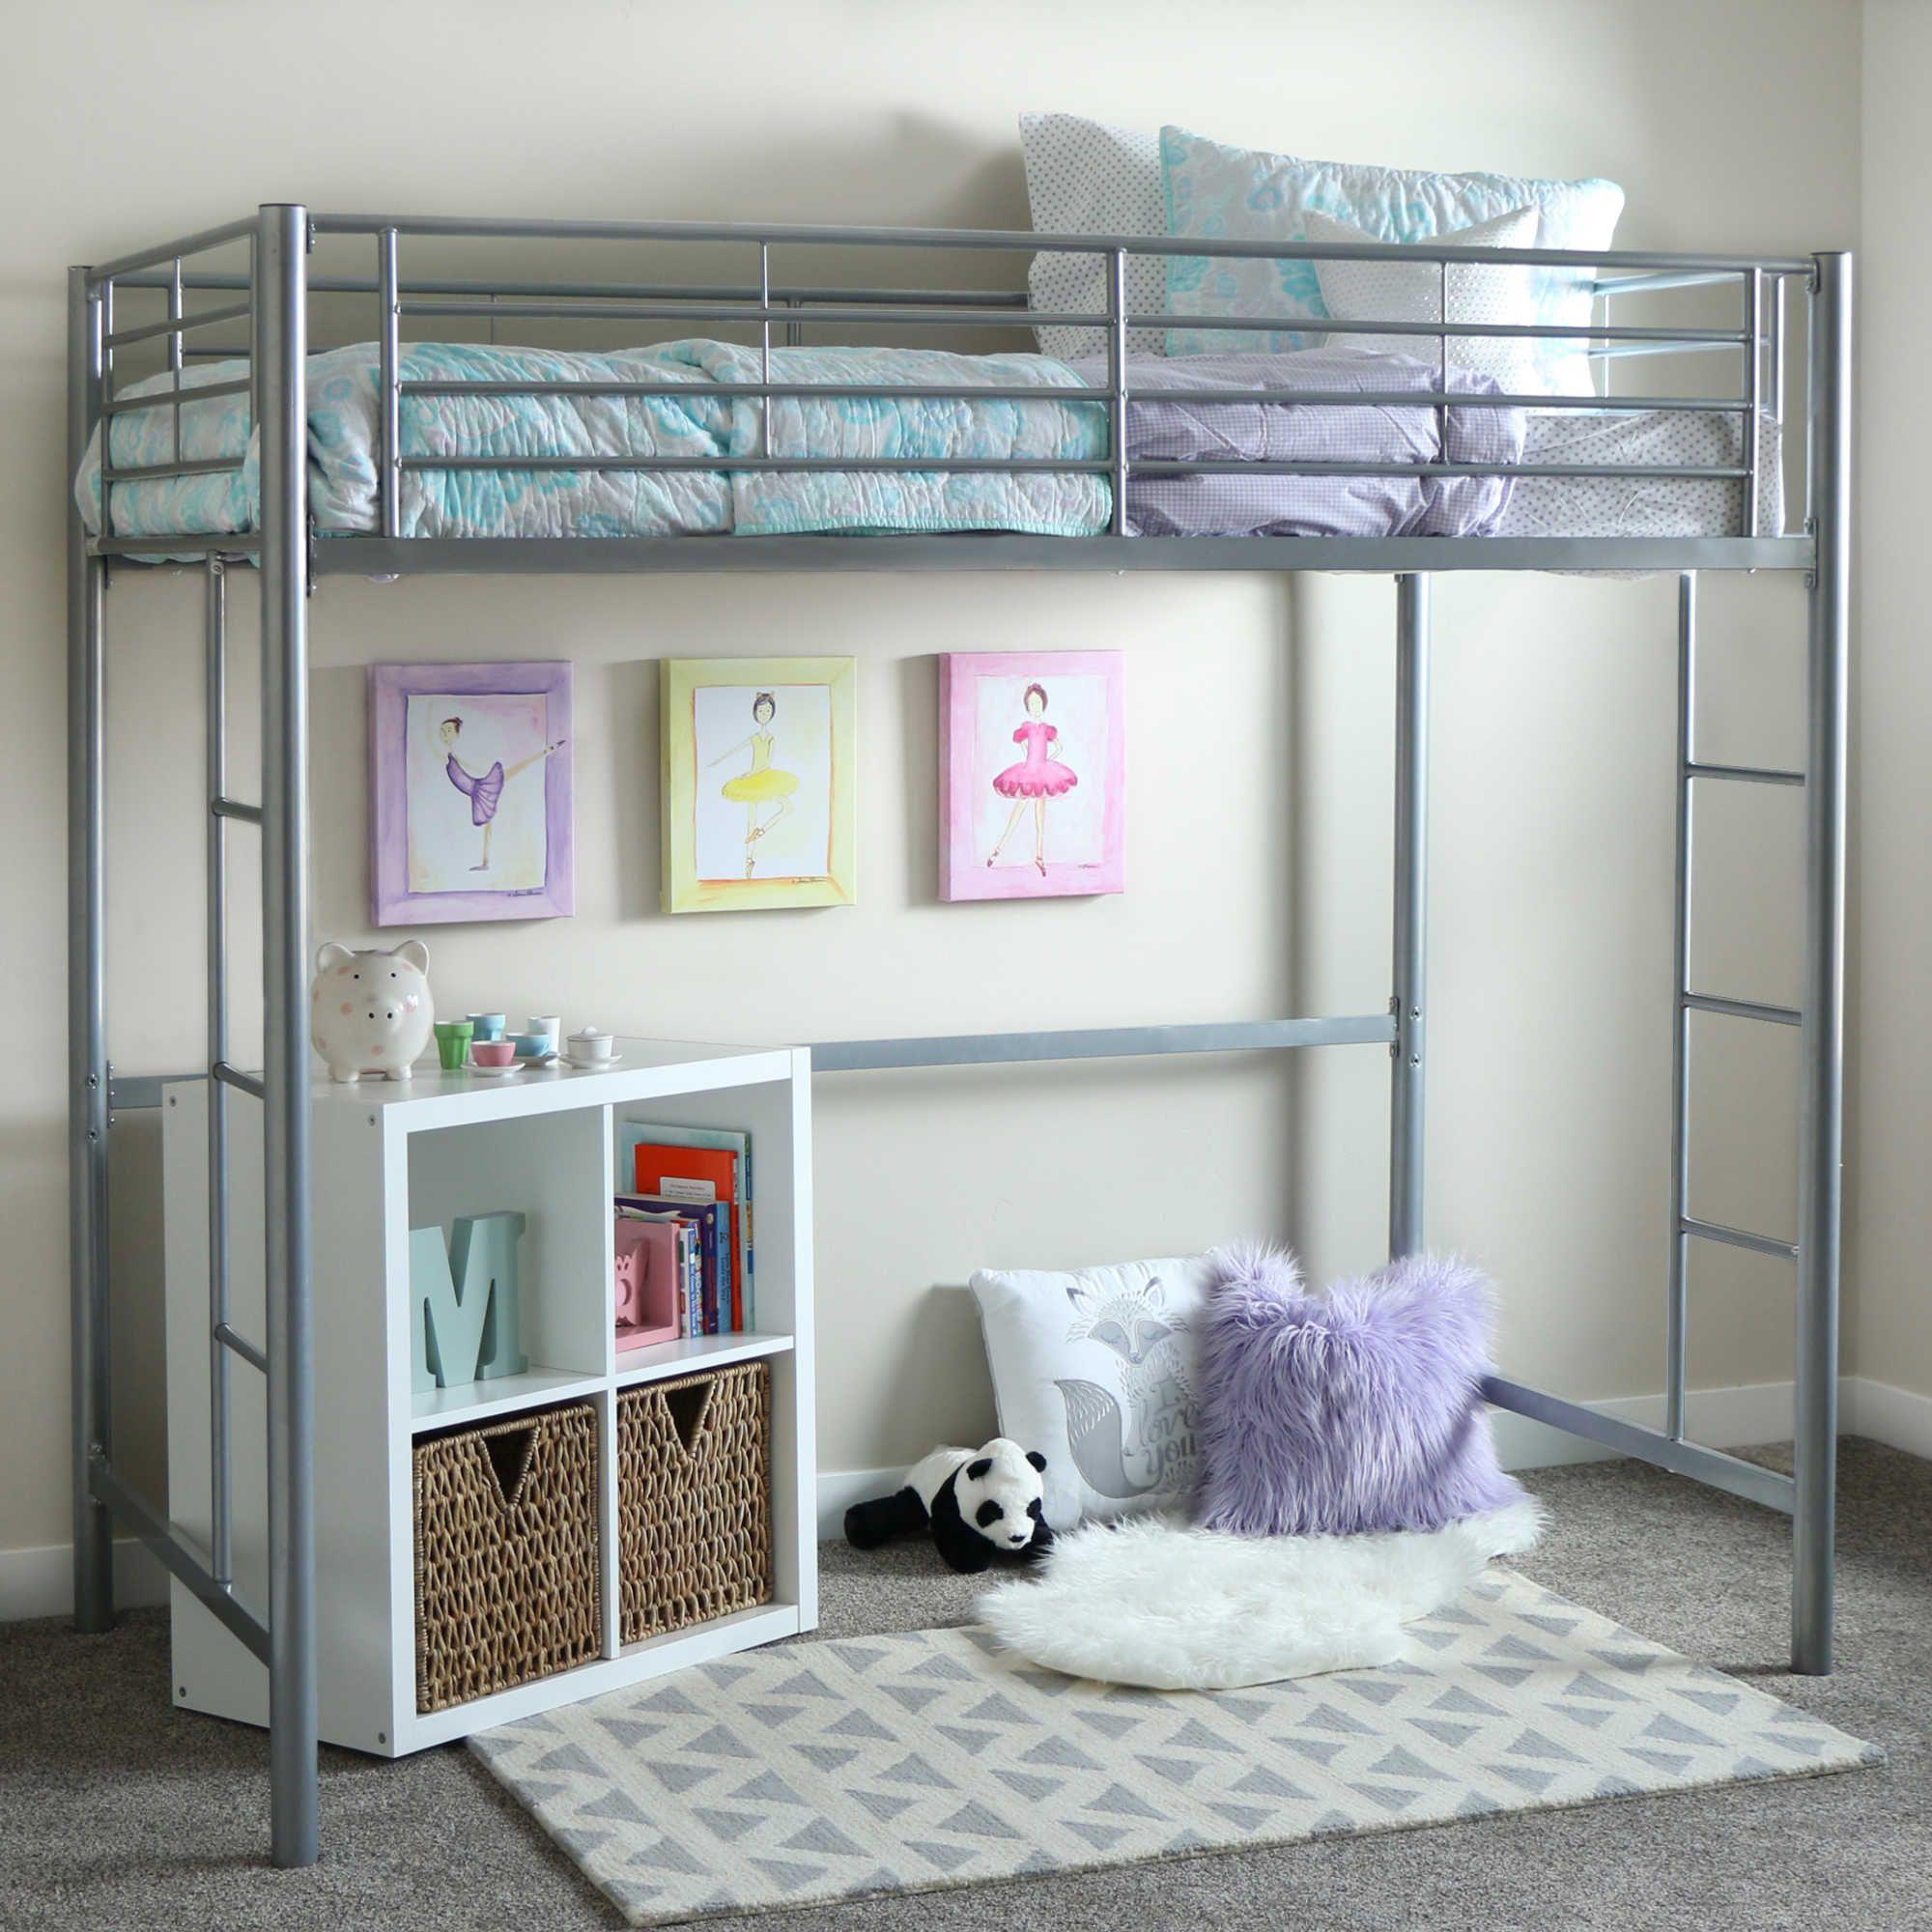 Pink Or Silver Twin Size Metal Loft Bed Frame Kids Bunk Bedroom Dorm Space Saver Furniture Home Garden